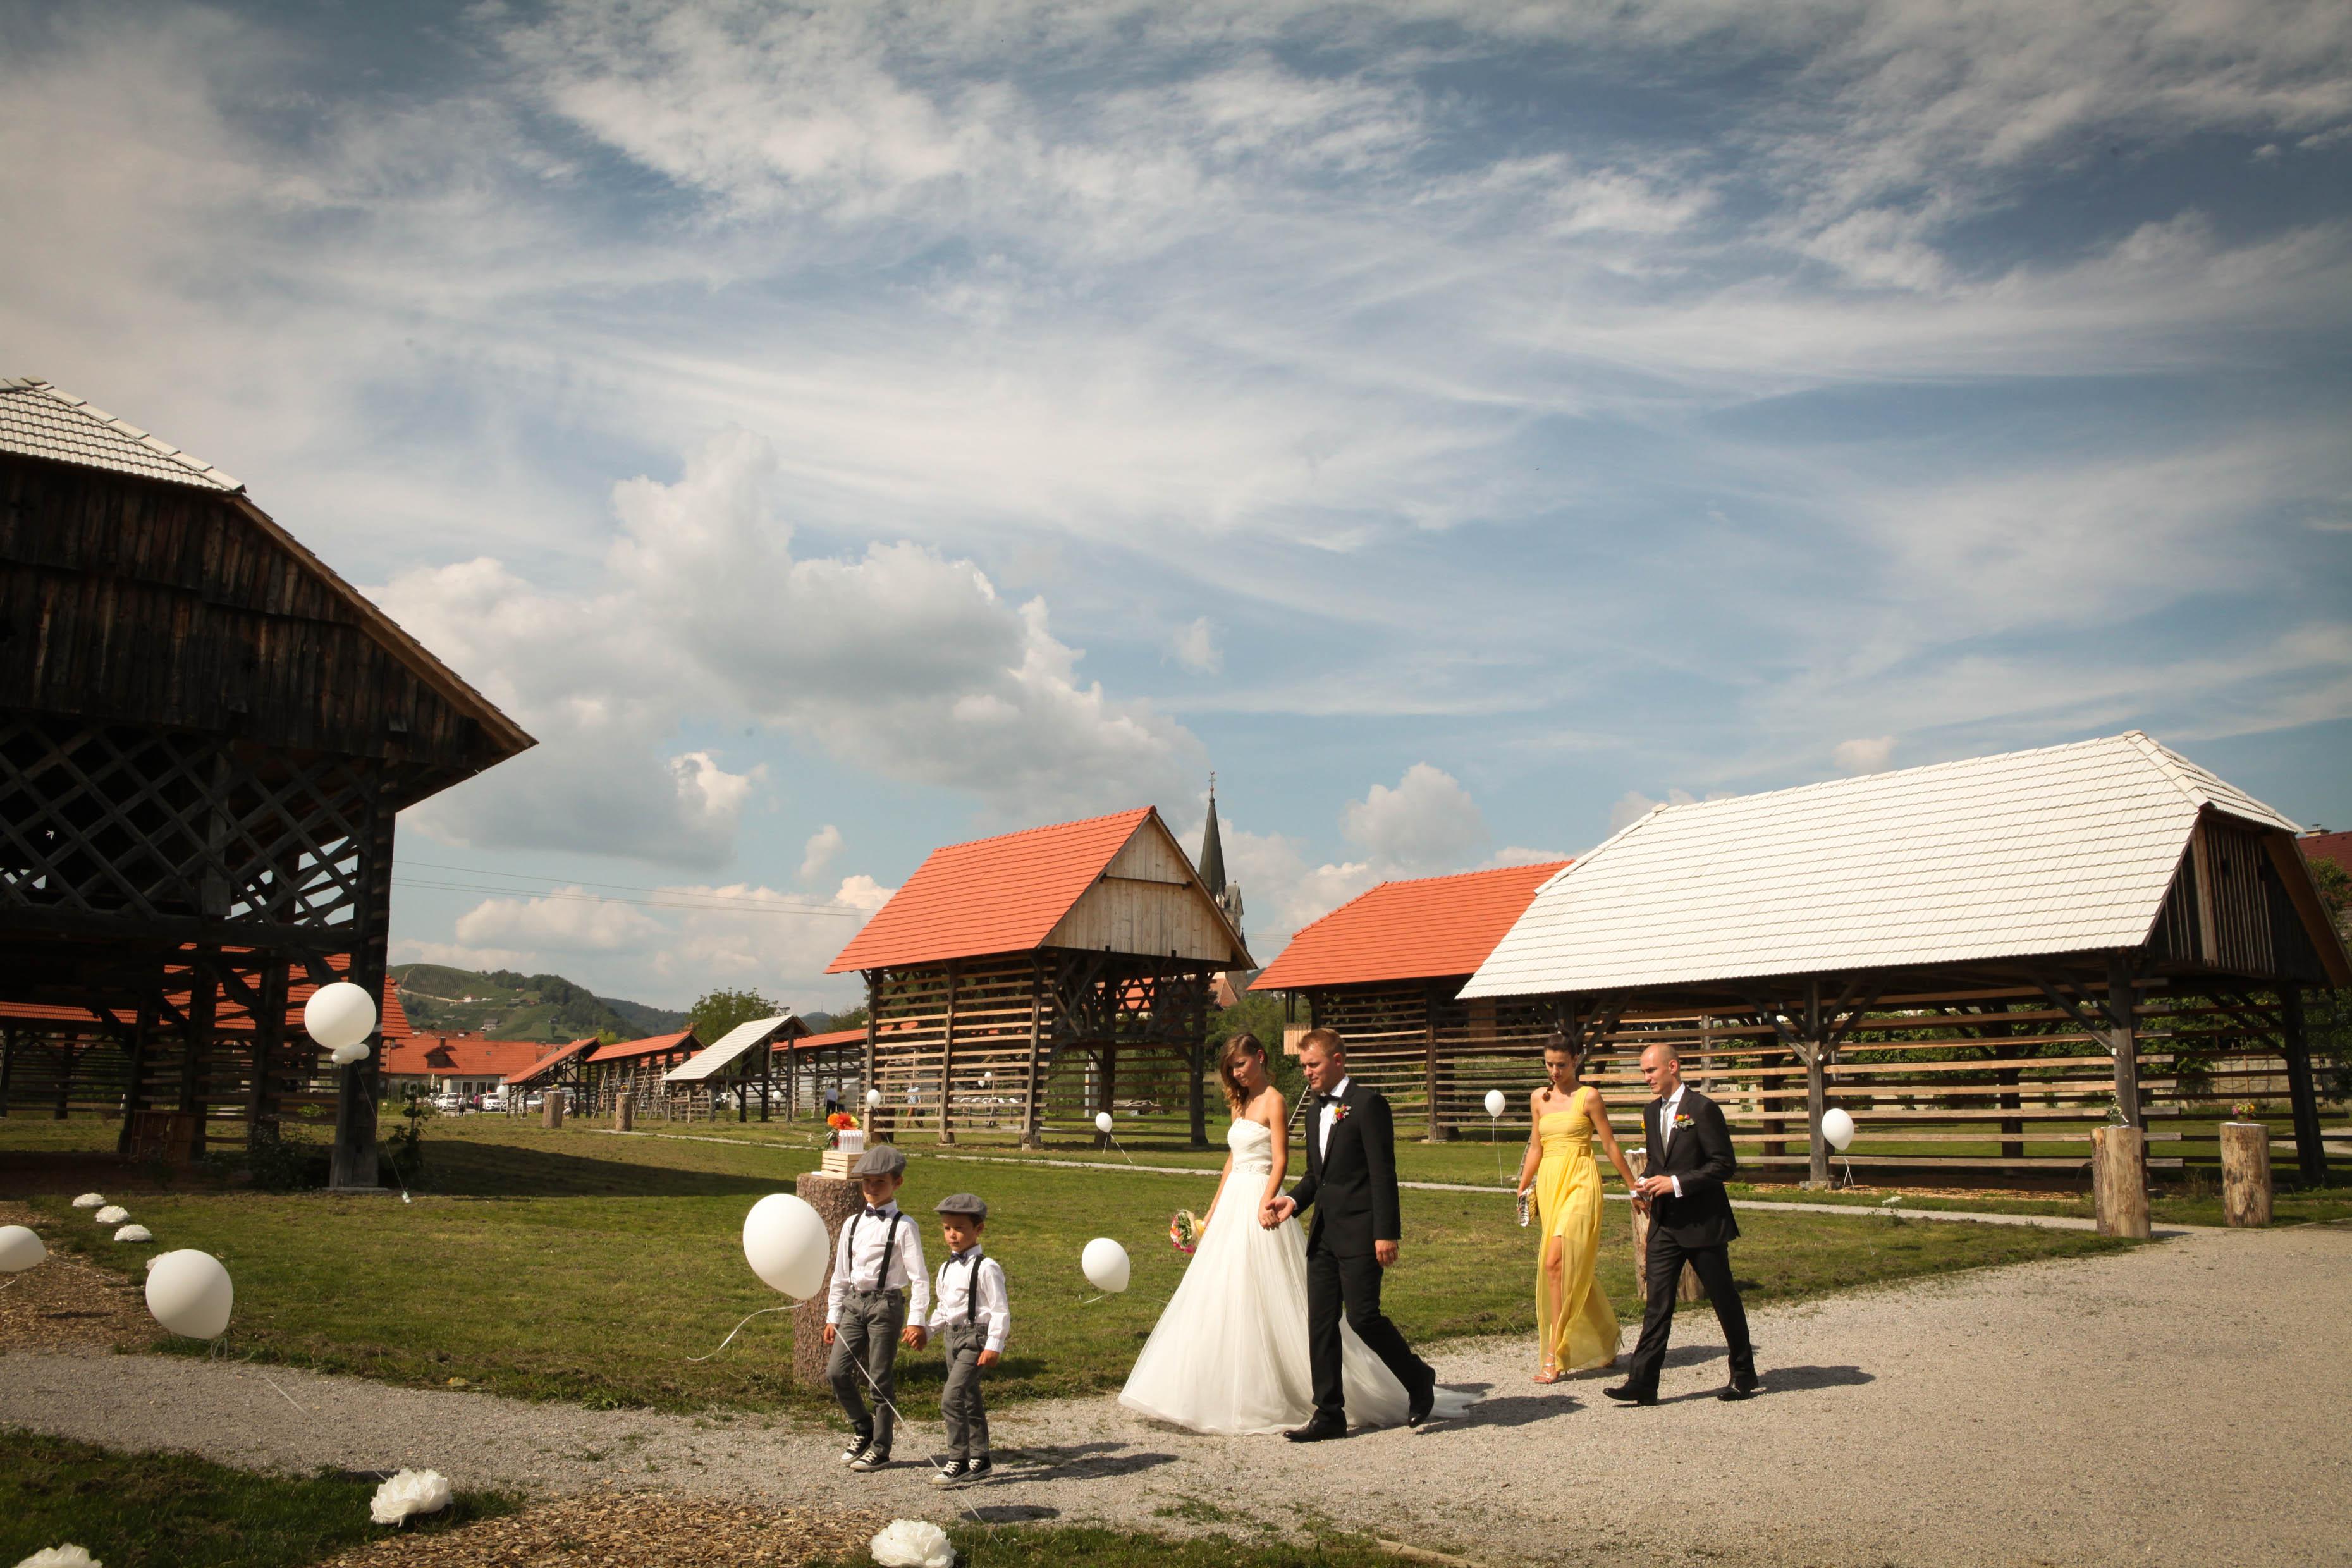 Poroka-na-prostem-Dezela-kozolcev-Sentrupert-foto-Alenka-Lamovsek